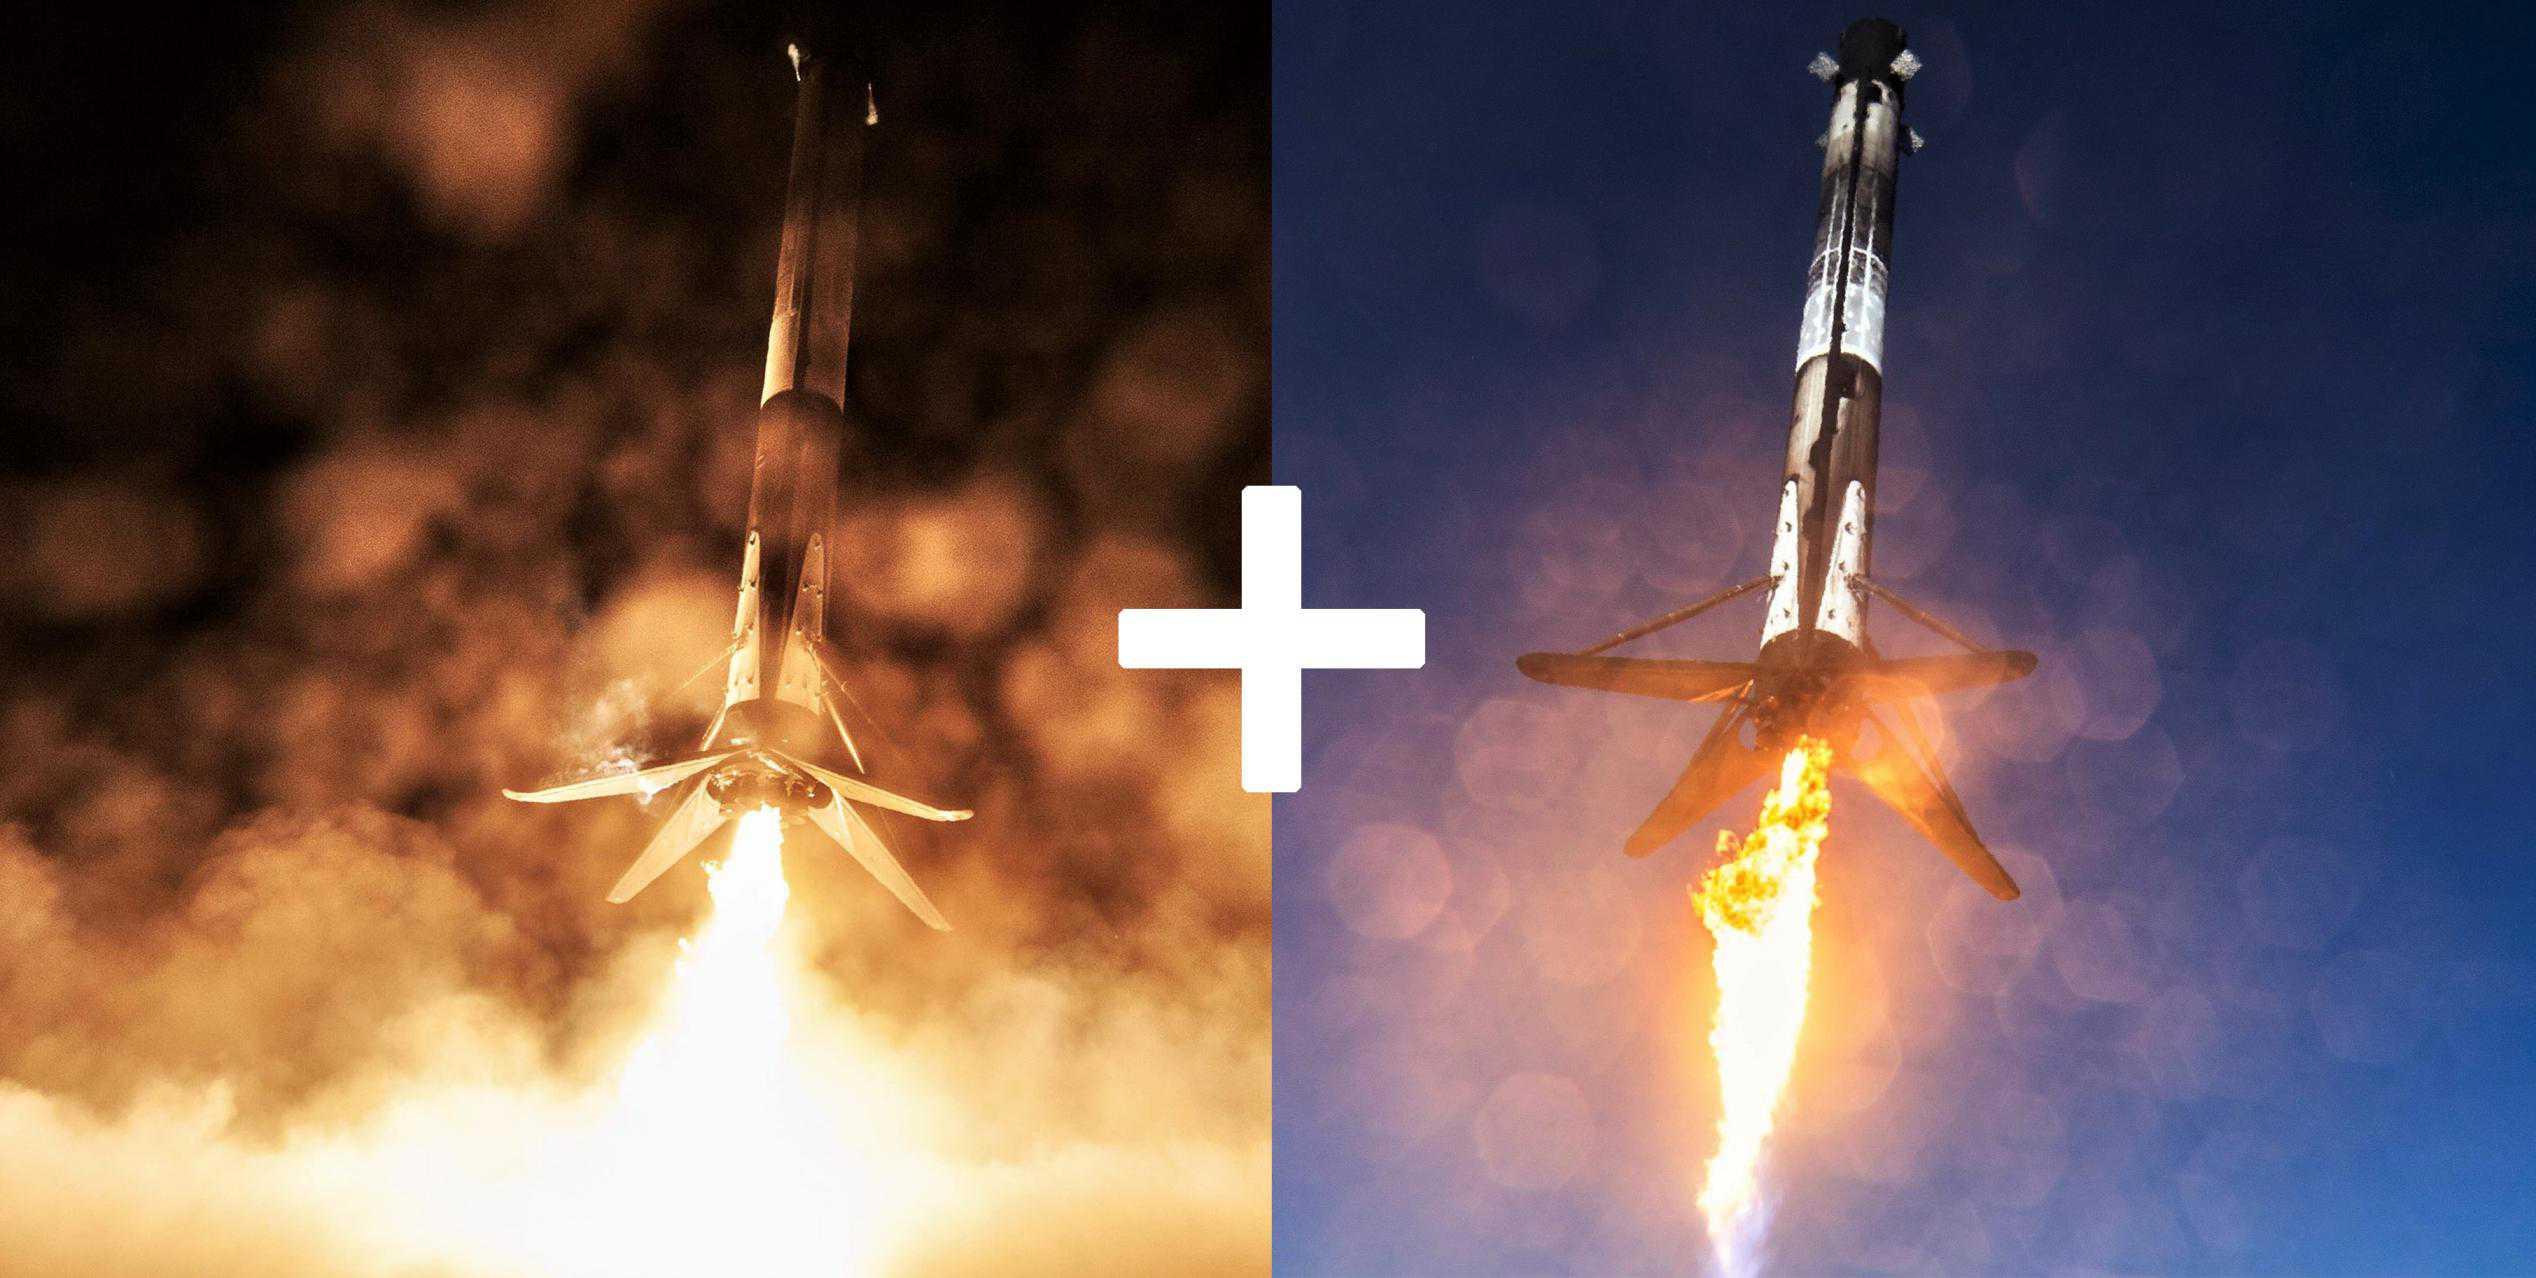 Falcon 9 B1051 B1046 DM-1 SSO-A landings (Teslarati – SpaceX) 1 (c)